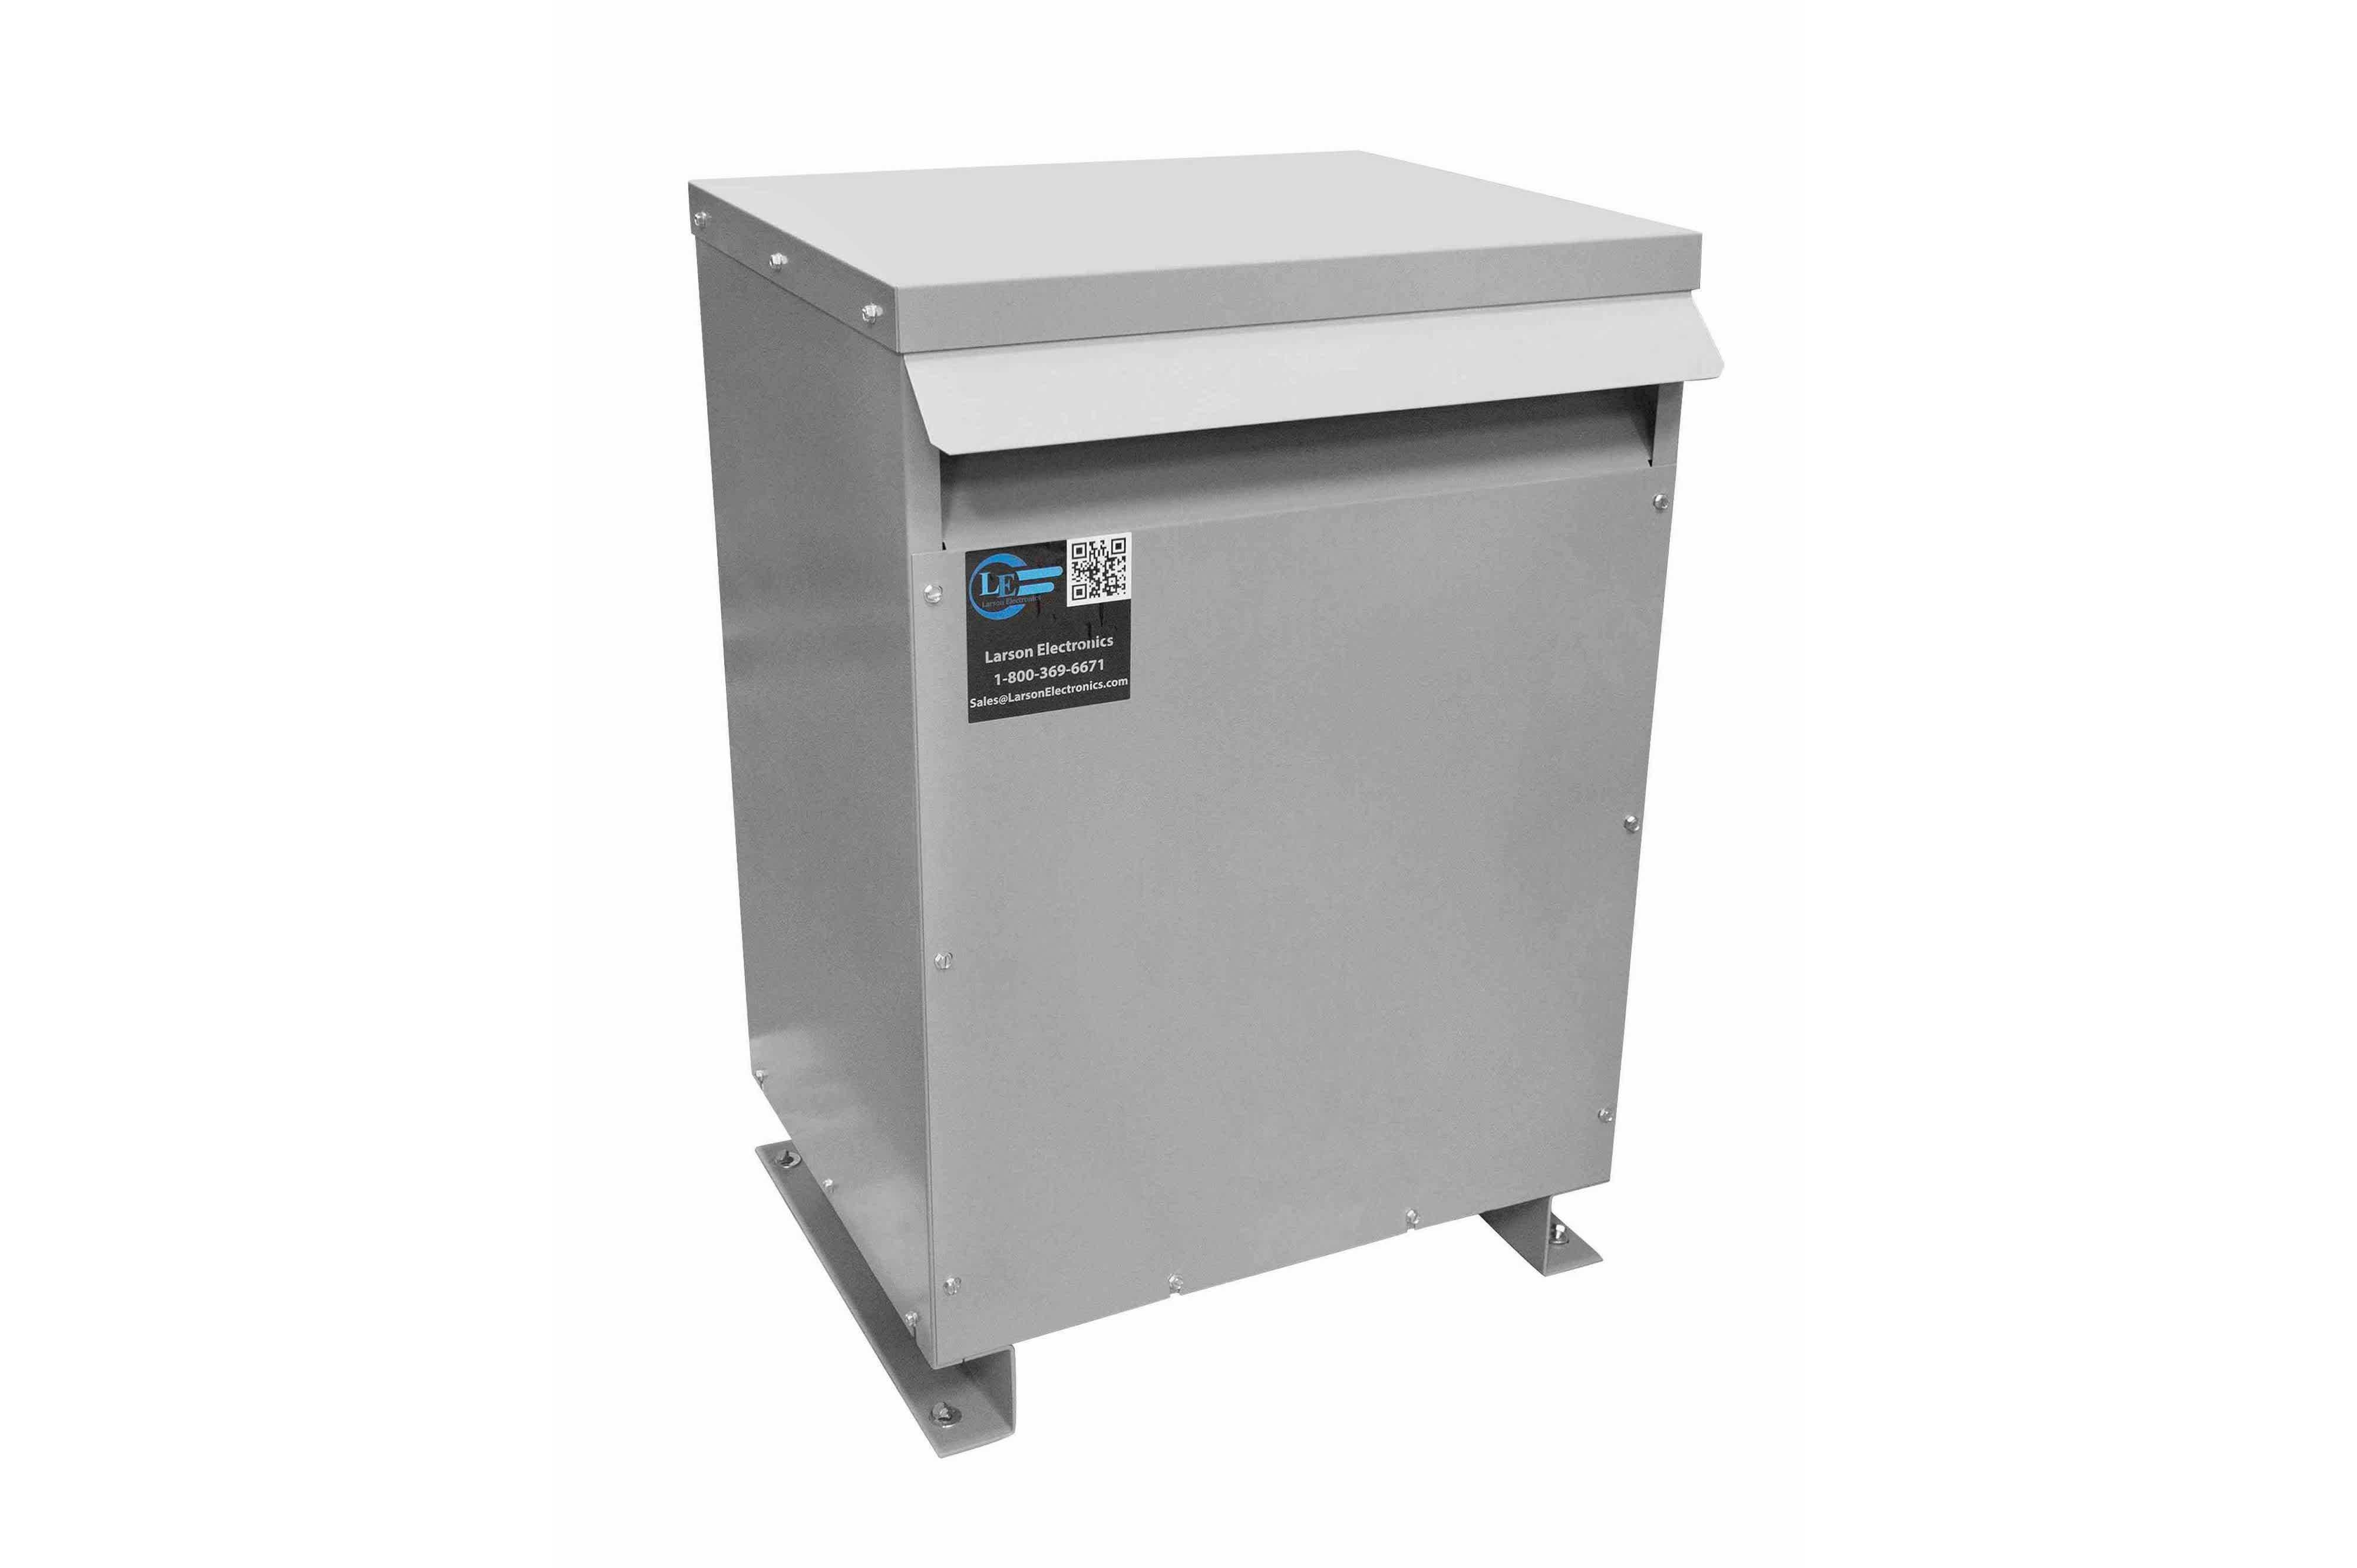 250 kVA 3PH DOE Transformer, 440V Delta Primary, 208Y/120 Wye-N Secondary, N3R, Ventilated, 60 Hz